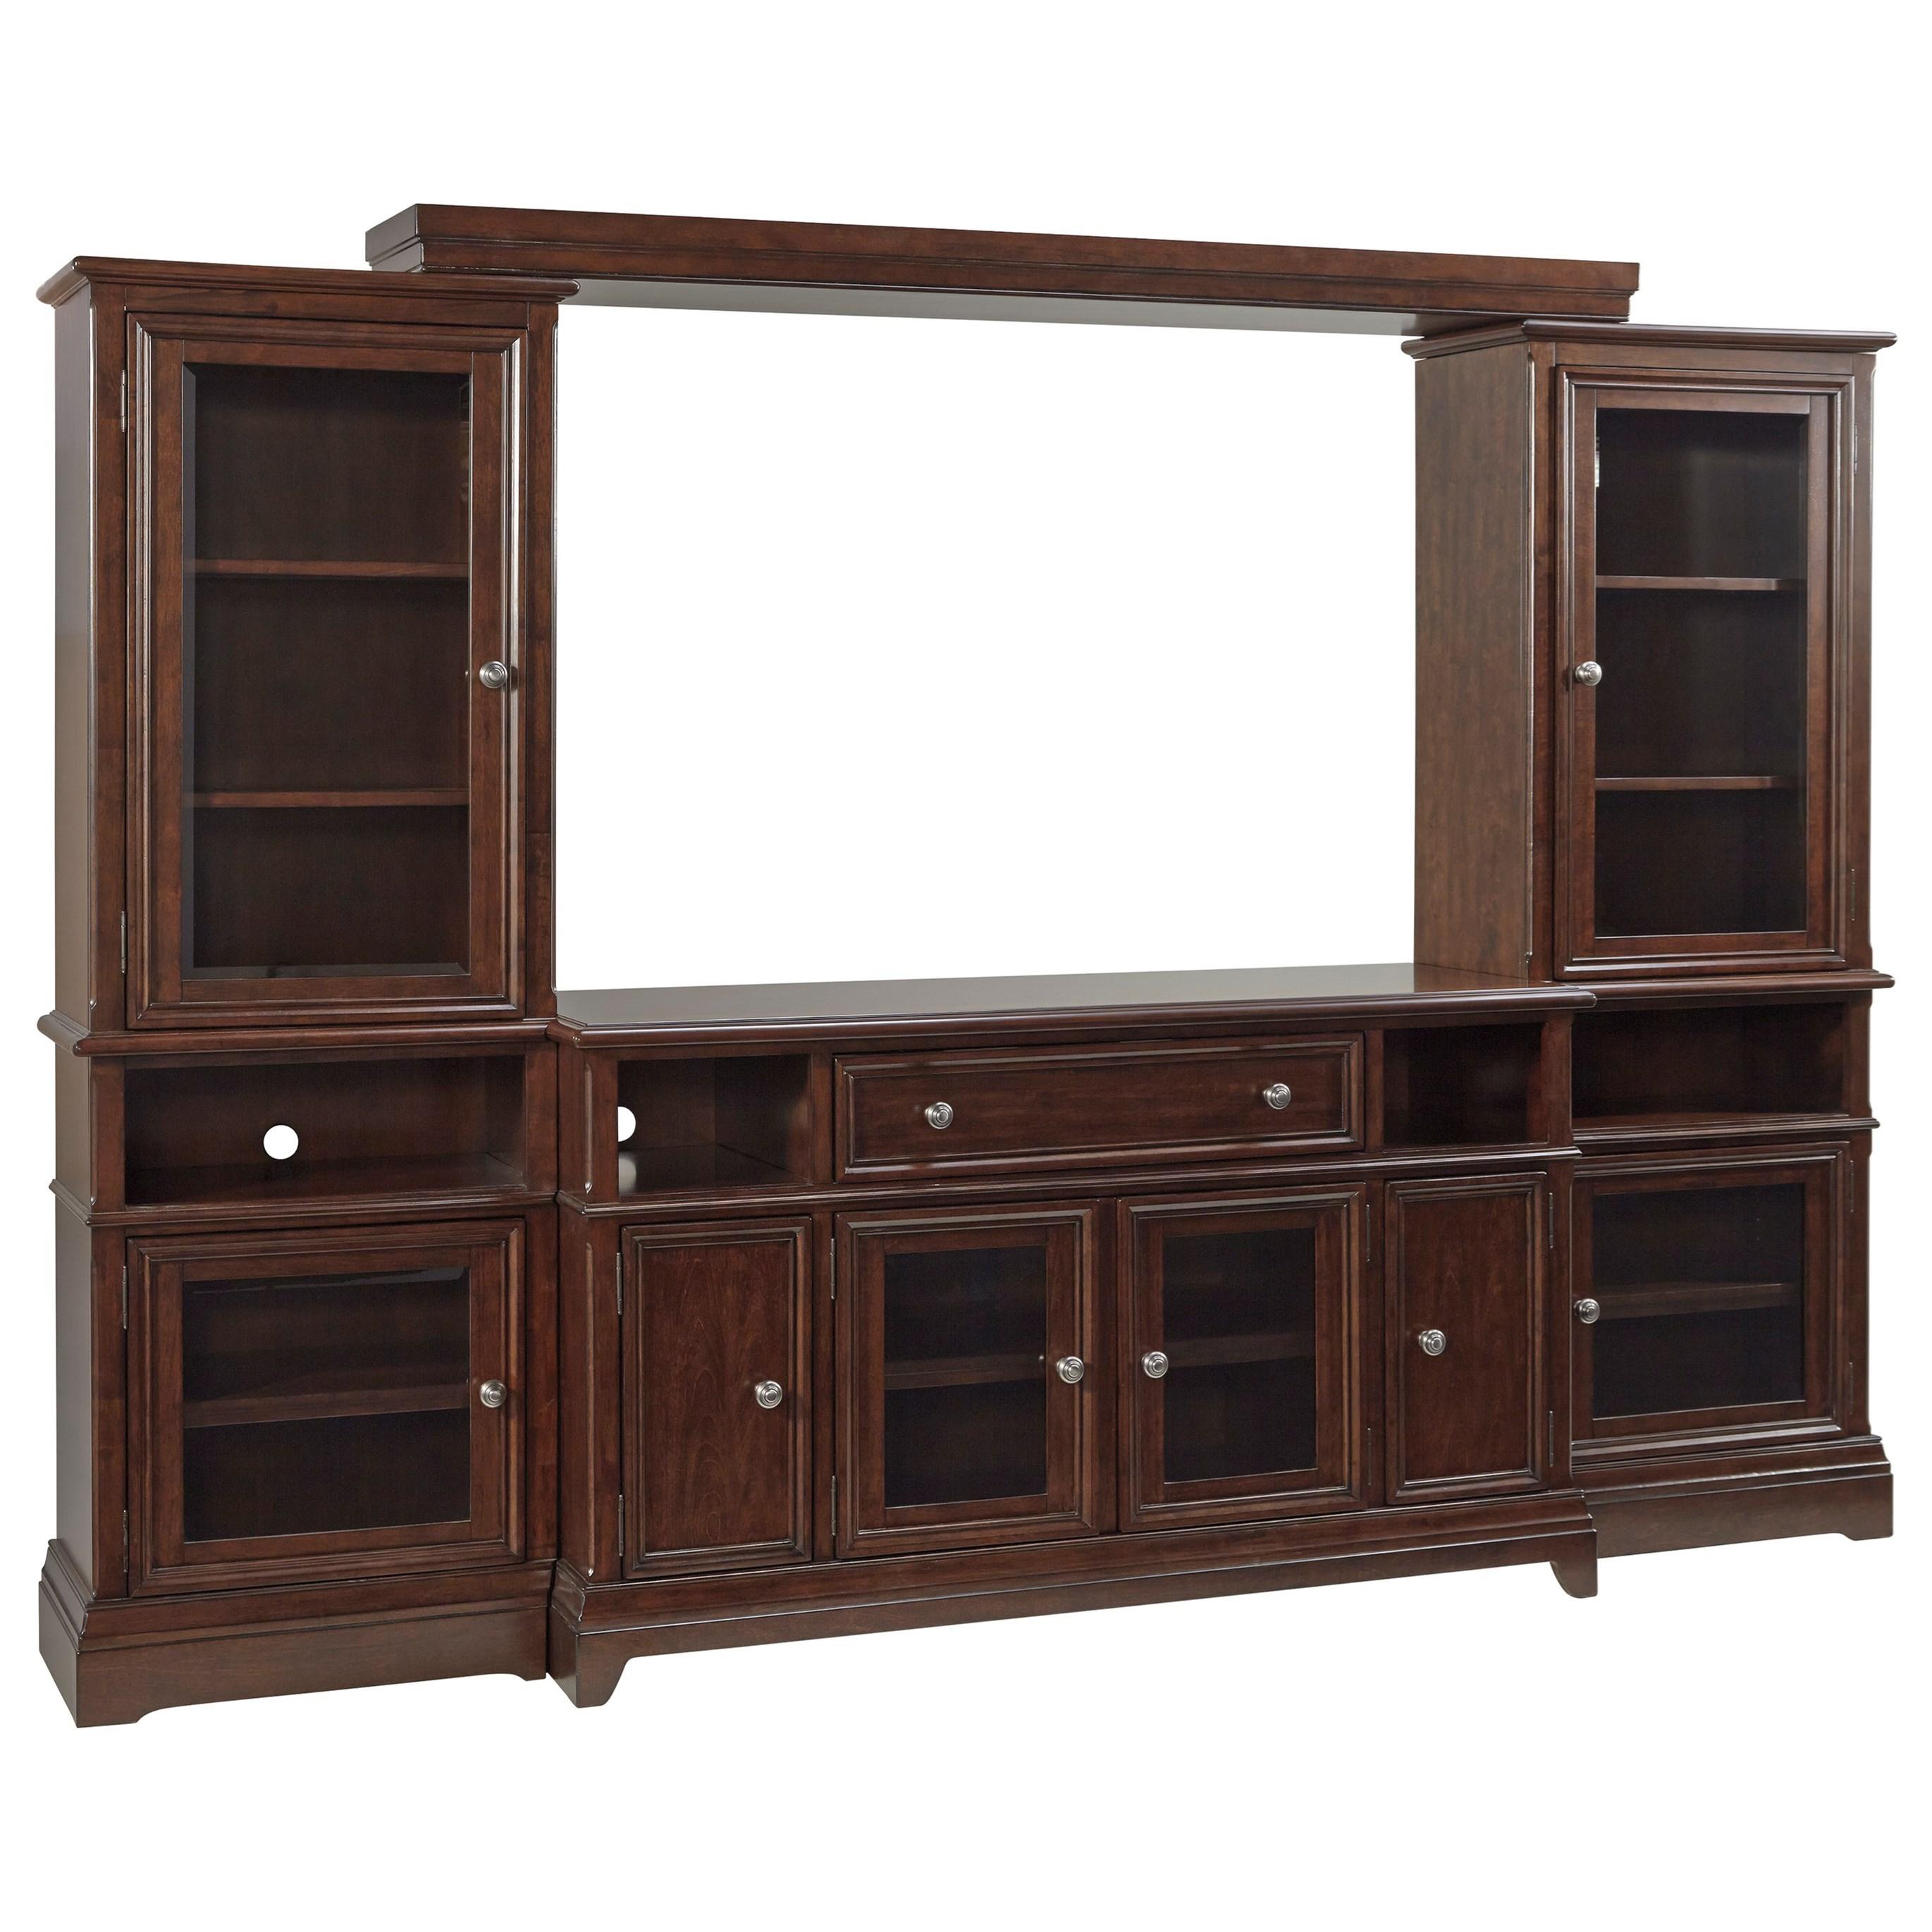 Ashley Furniture Thanksgiving Sale: Ivan Smith Furniture Black Friday Sale